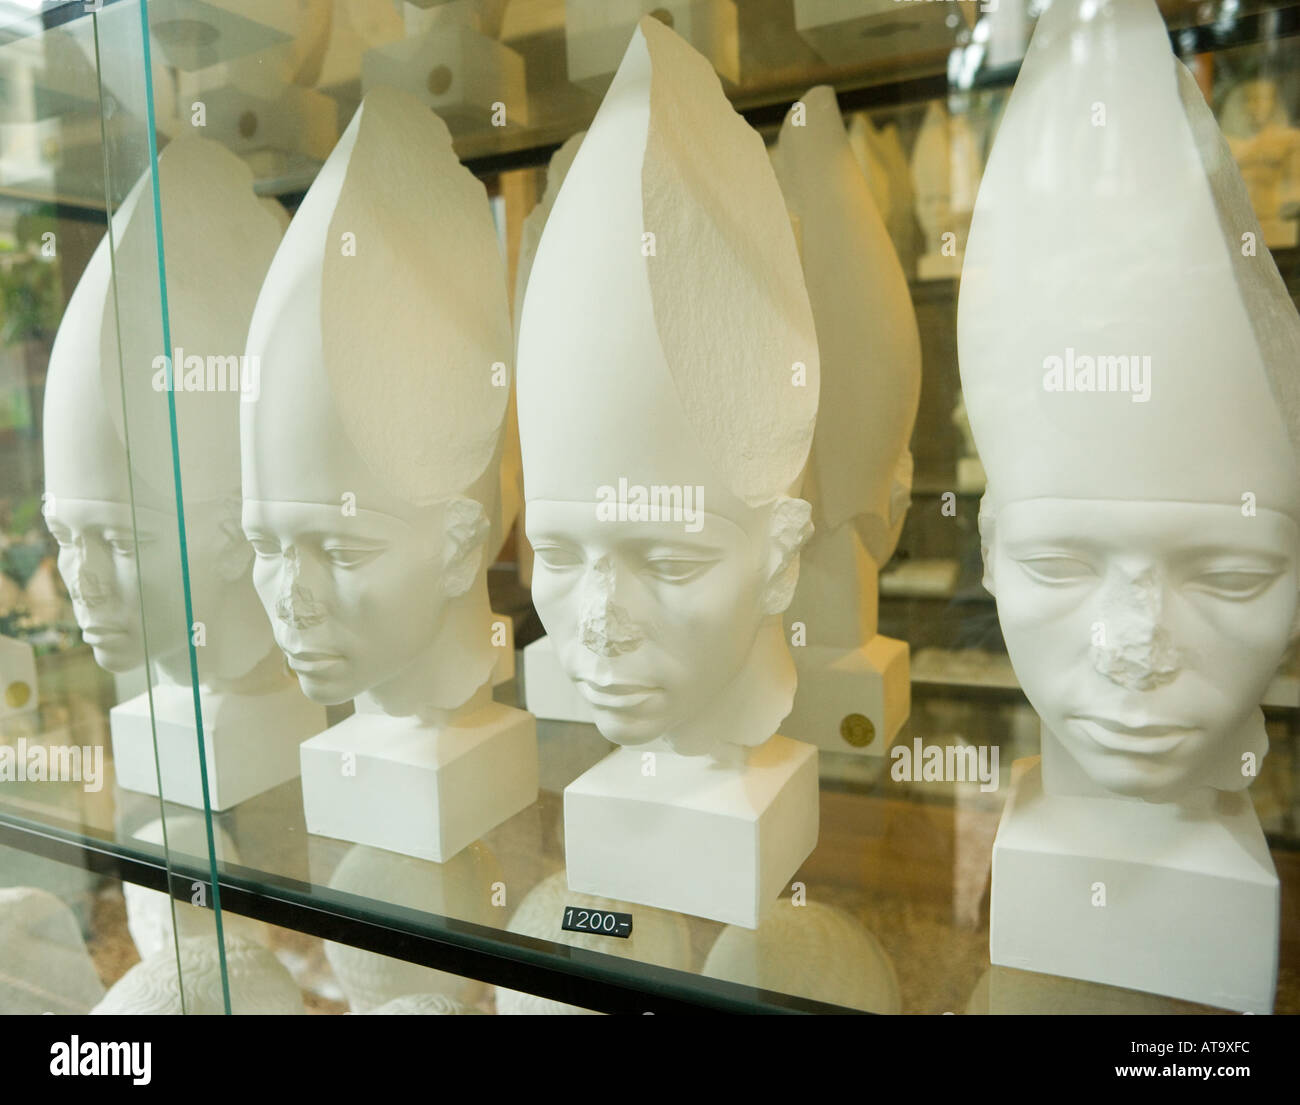 Copenhagen Denmark Ny Carlsberg Glyptotek Souvenir sculpted heads for sale in museum shop - Stock Image